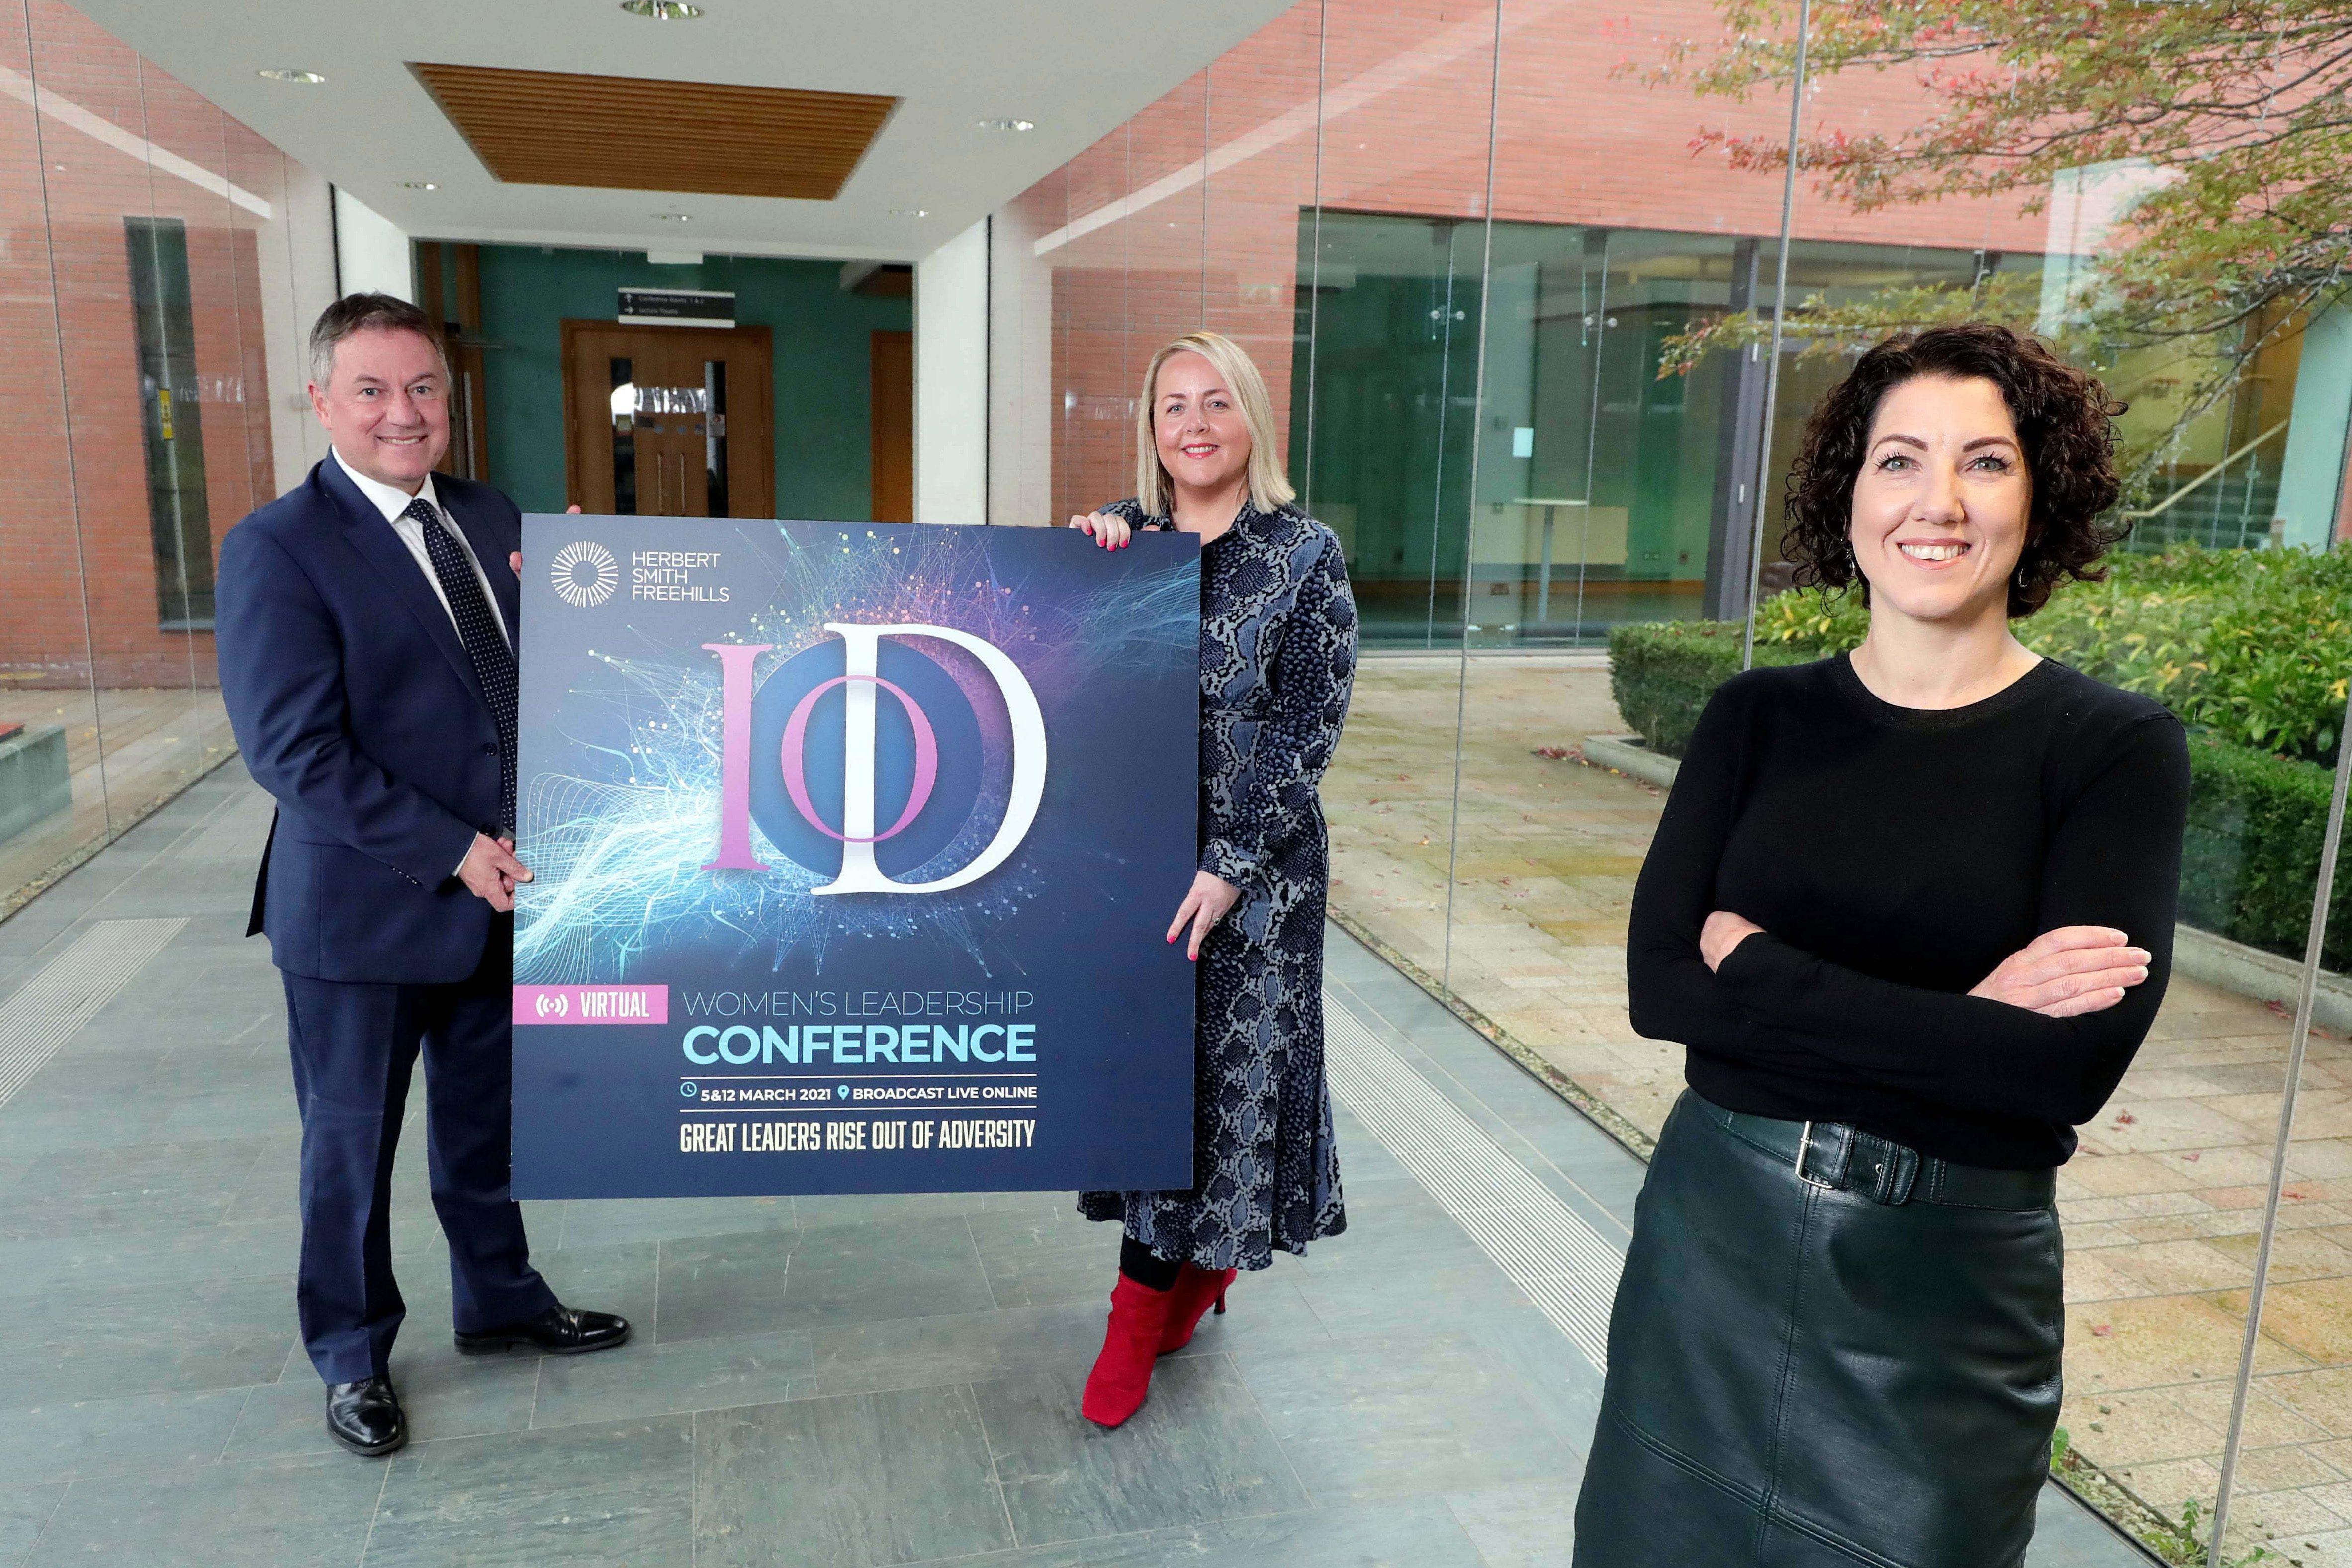 IoD Women's Leadership Conference Launch with Gordon Milligan, Kirsty McManus and sponsor representative Lisa McLaughlin